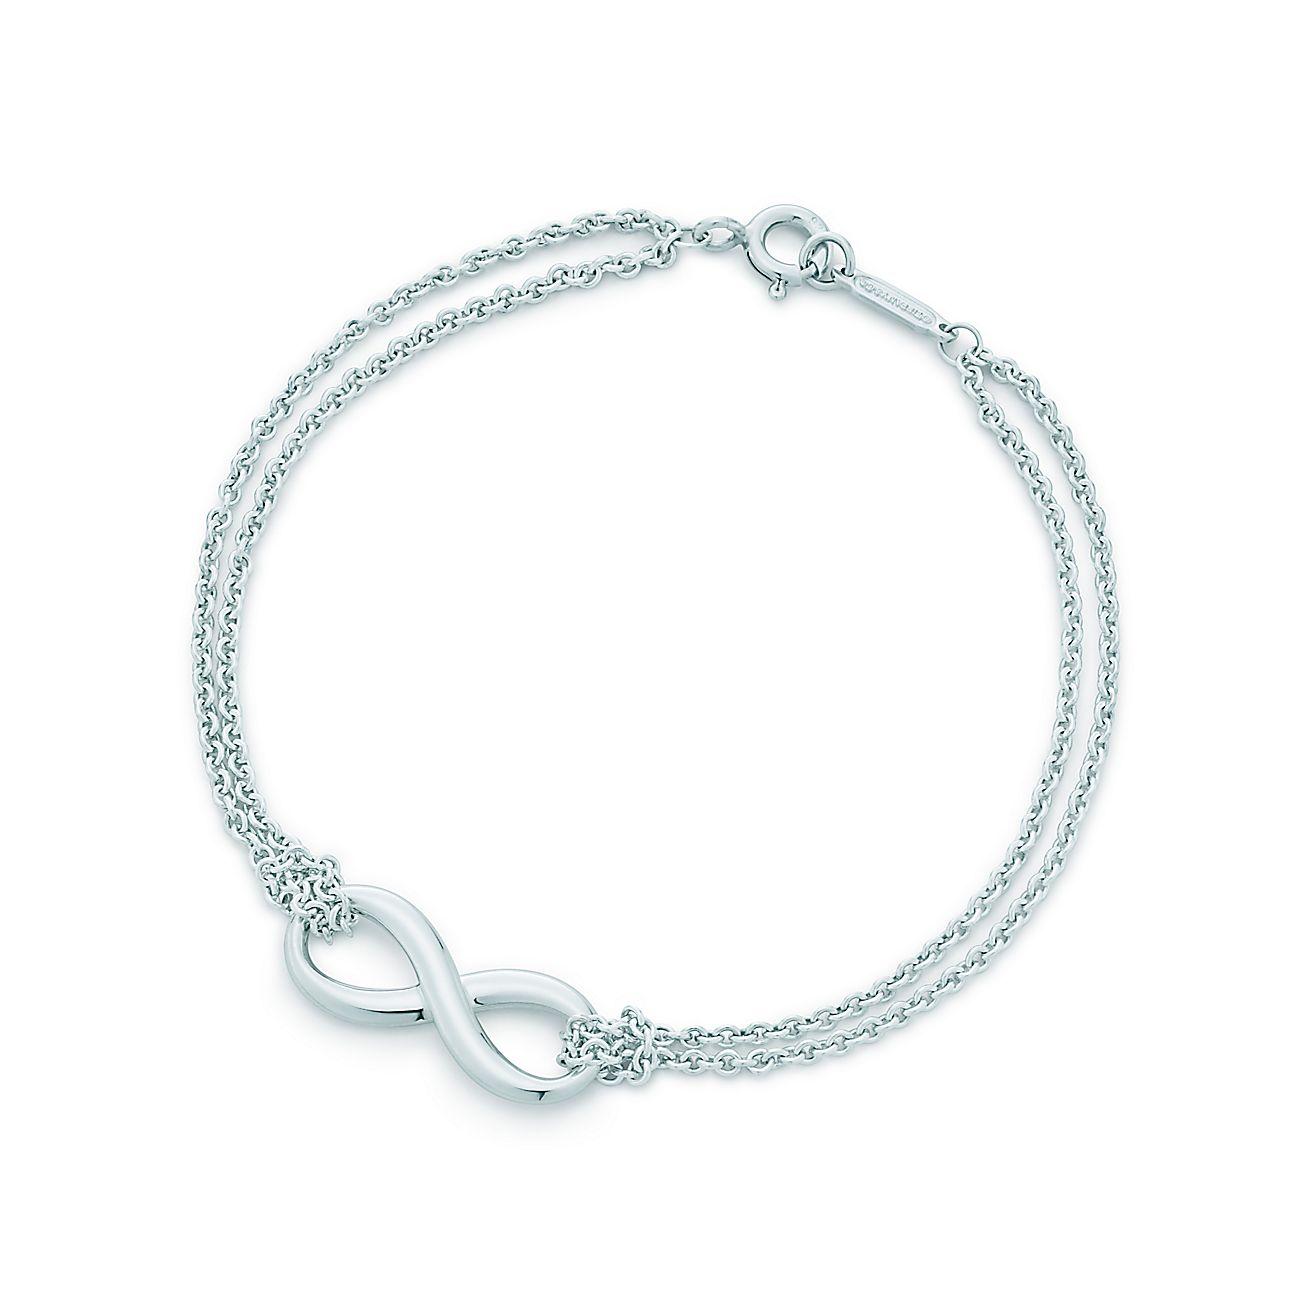 Tiffany Infinity:Bracelet